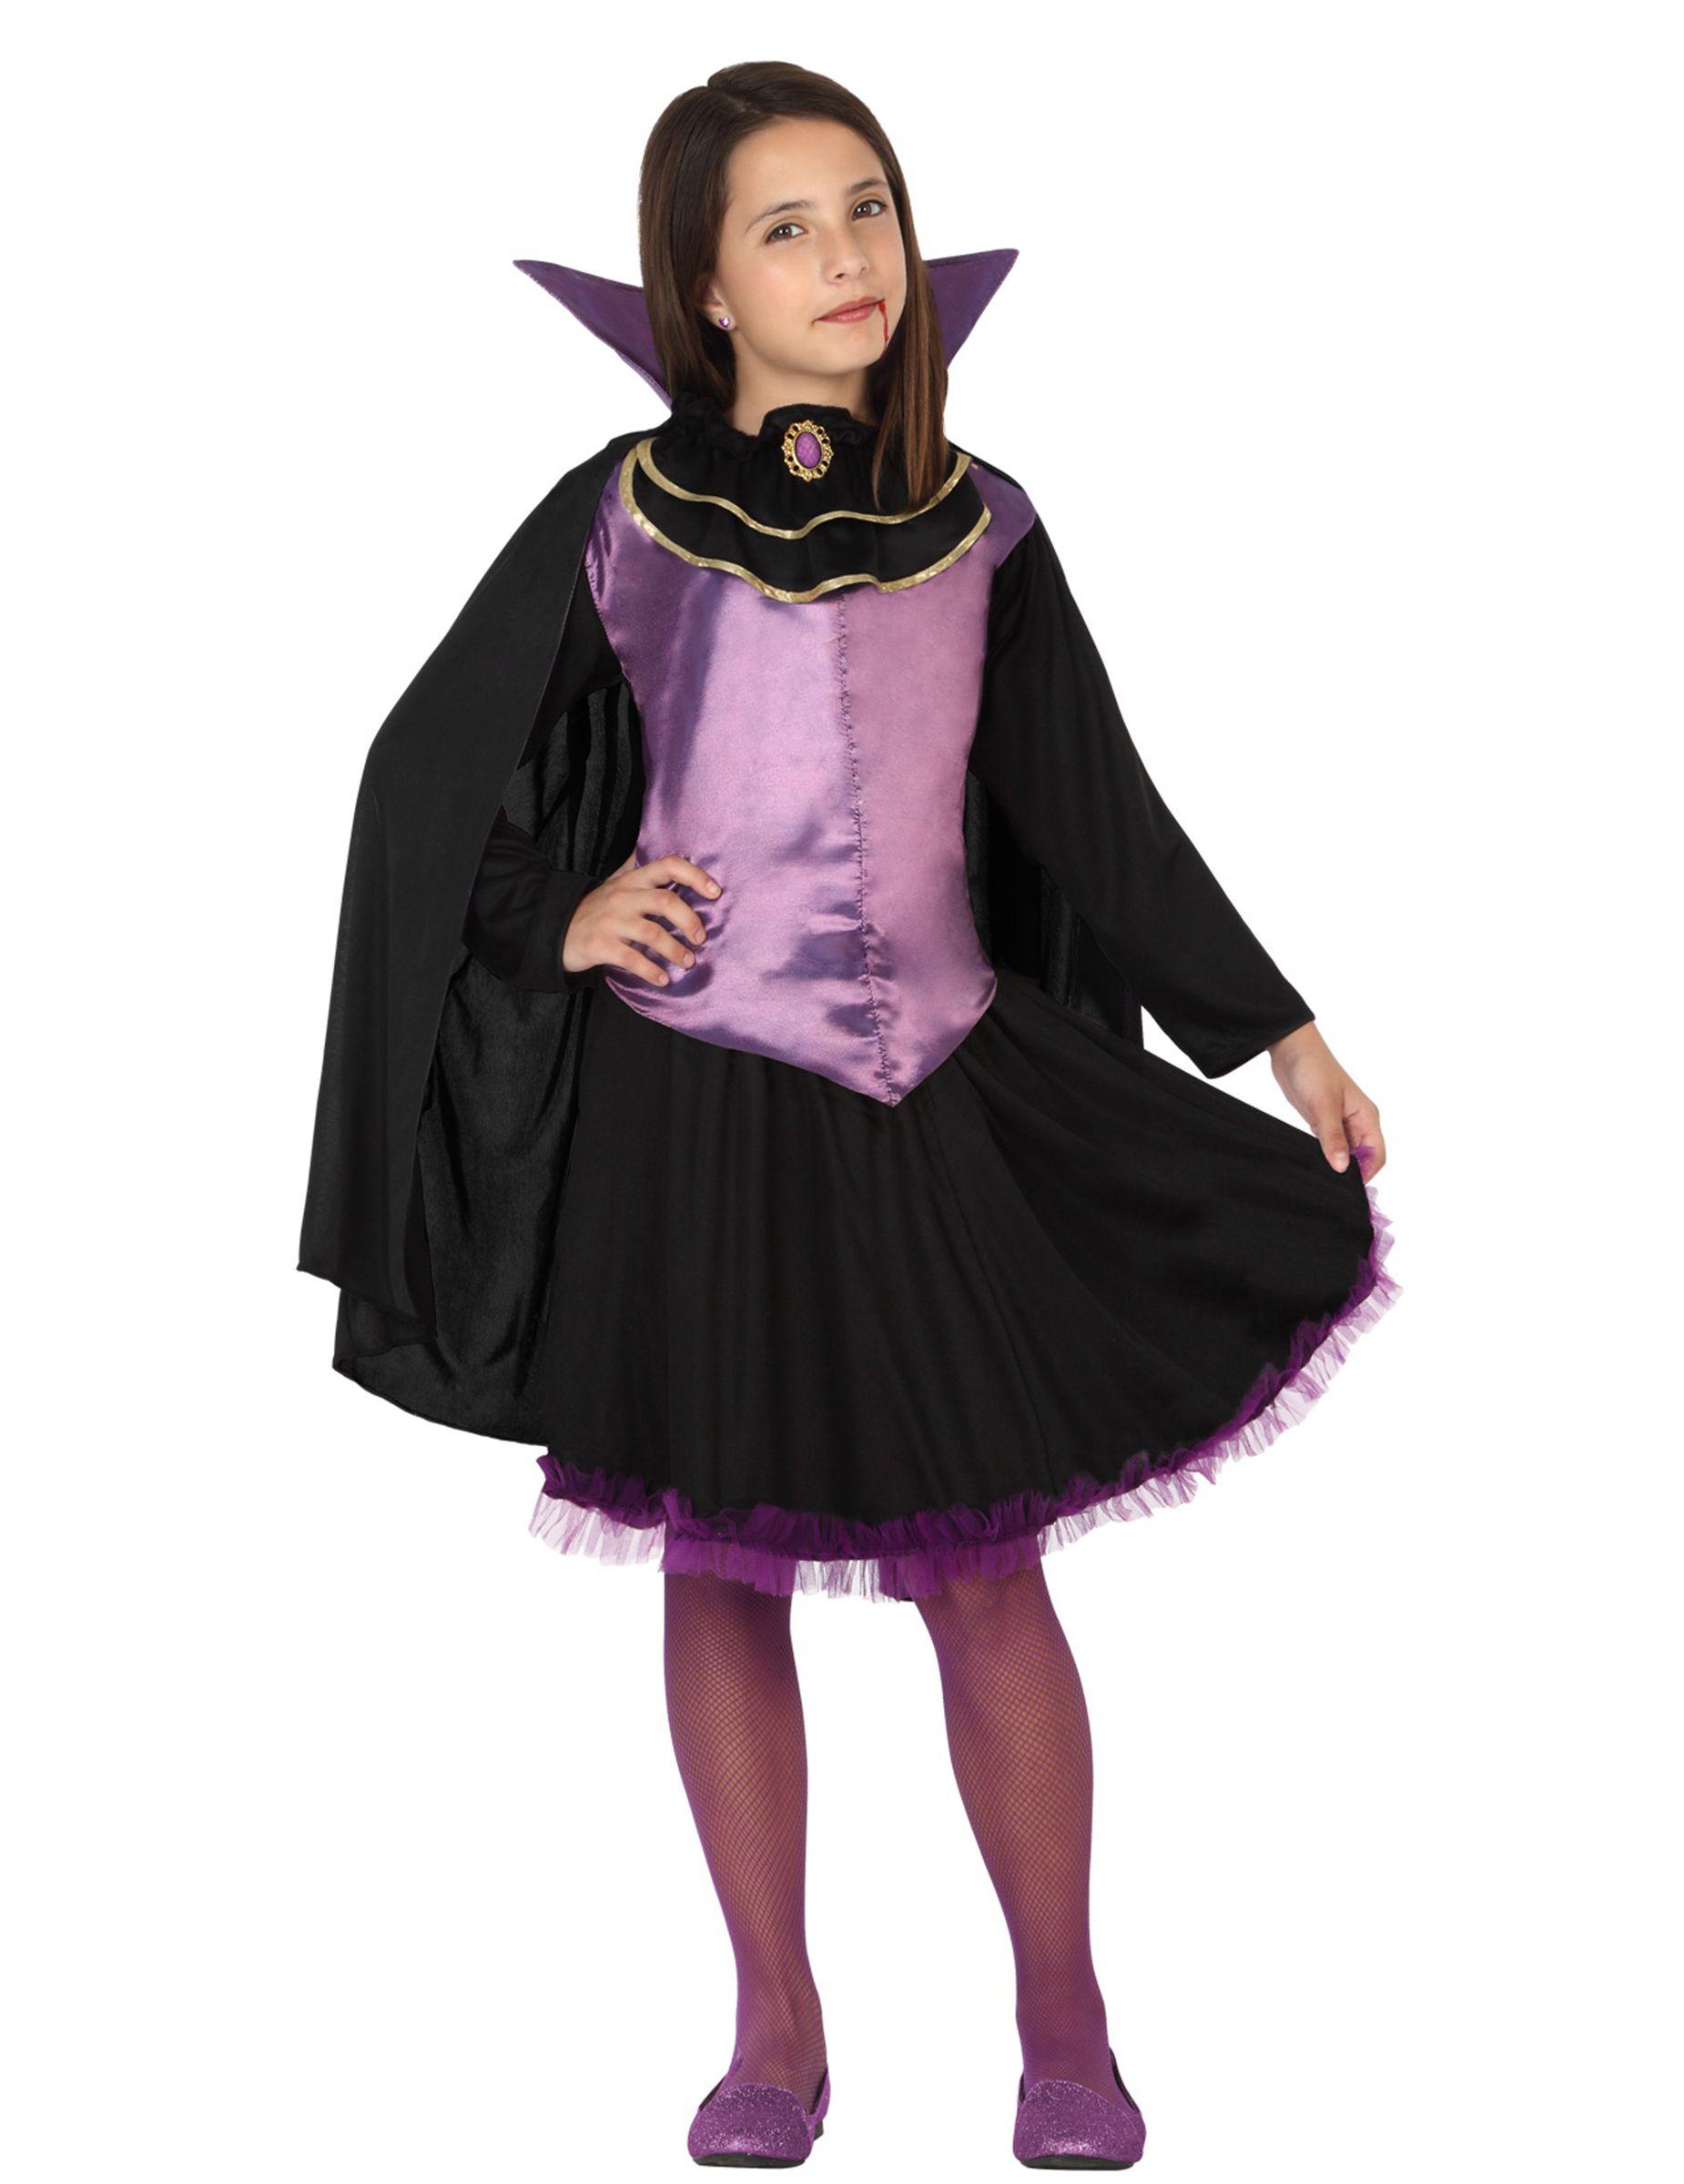 e6cfa783c2bc Disfraz vampiresa niña  Este disfraz de vampiresa para niña está formado  por una falda